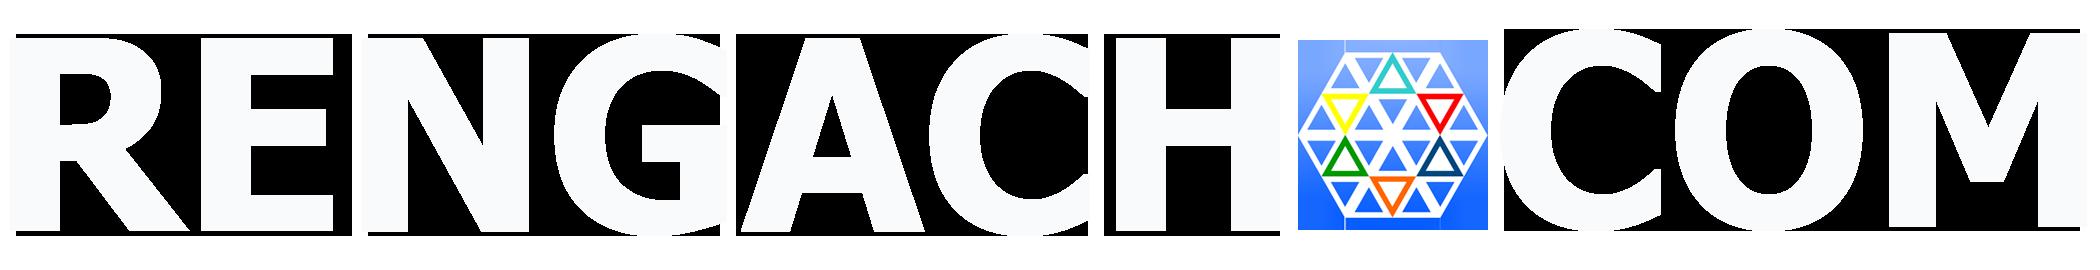 RENGACH